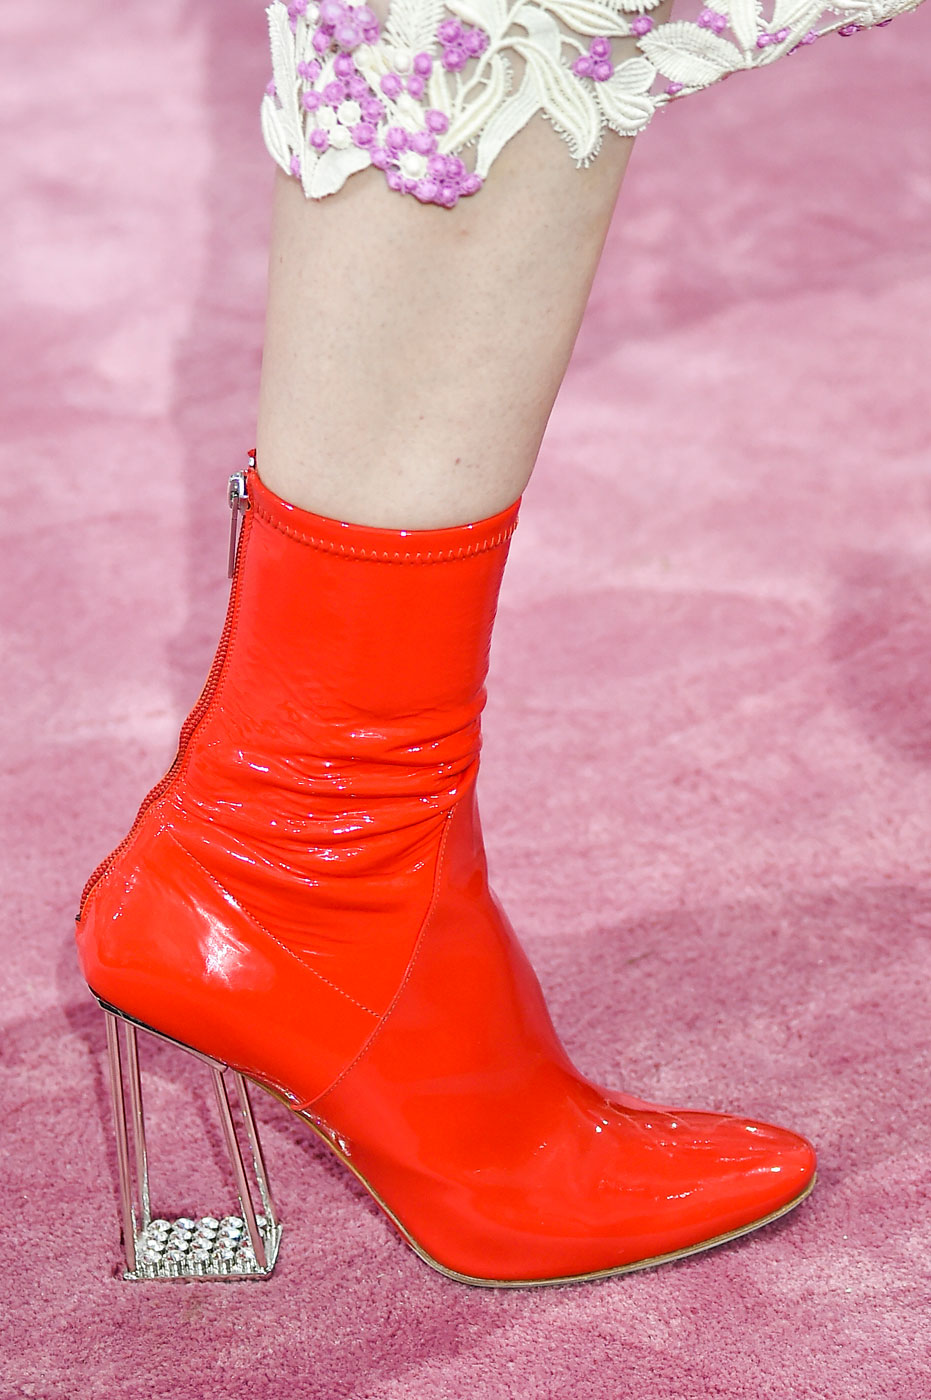 Christian-Dior-fashion-runway-show-close-ups-haute-couture-paris-spring-summer-2015-the-impression-112